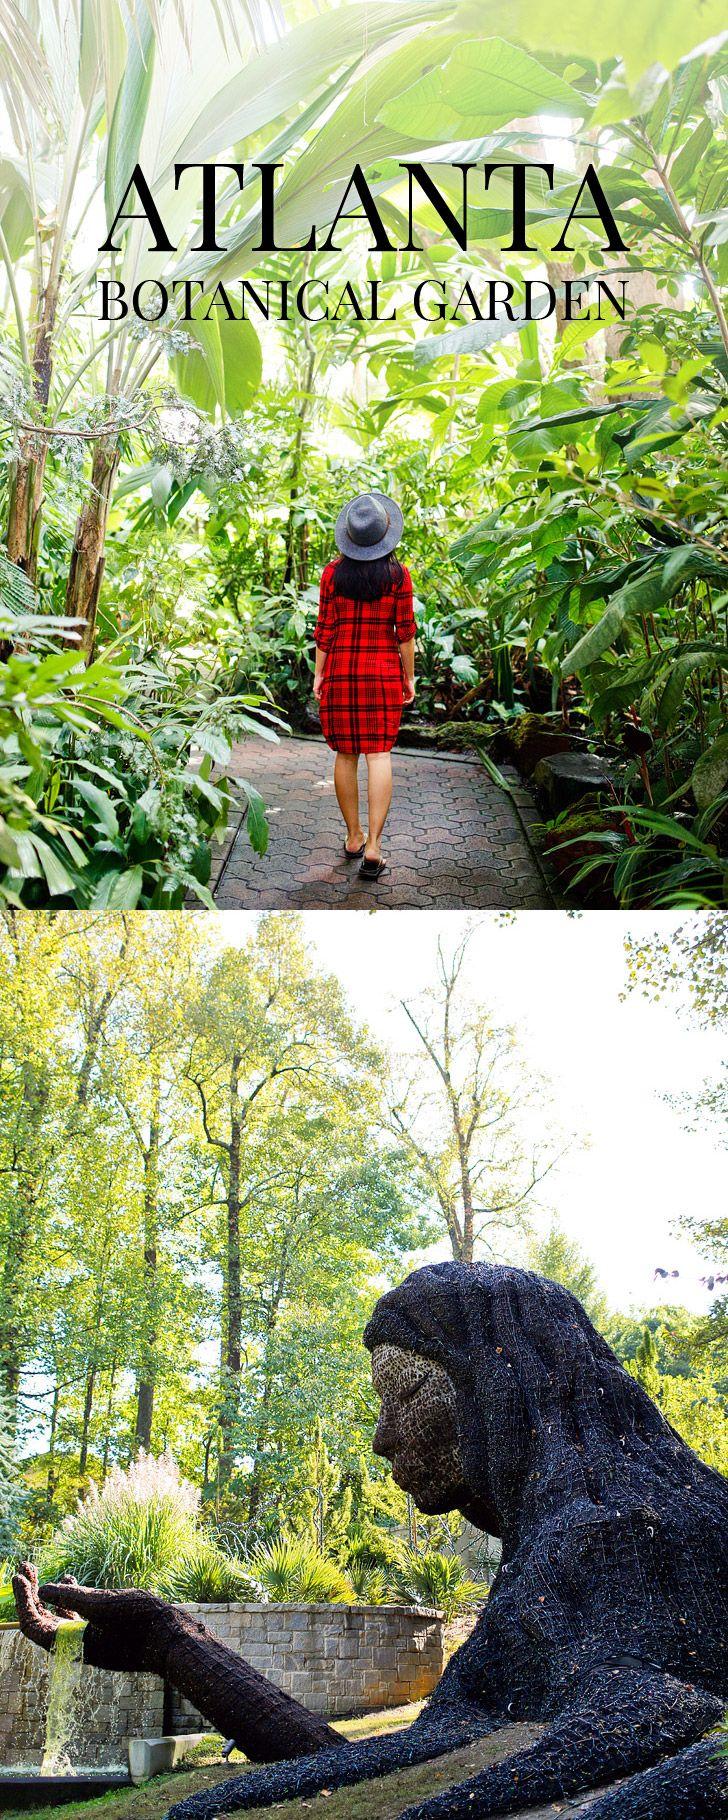 Earth Goddess Living Sculpture at the Atlanta Botanical Garden // localadventurer.com